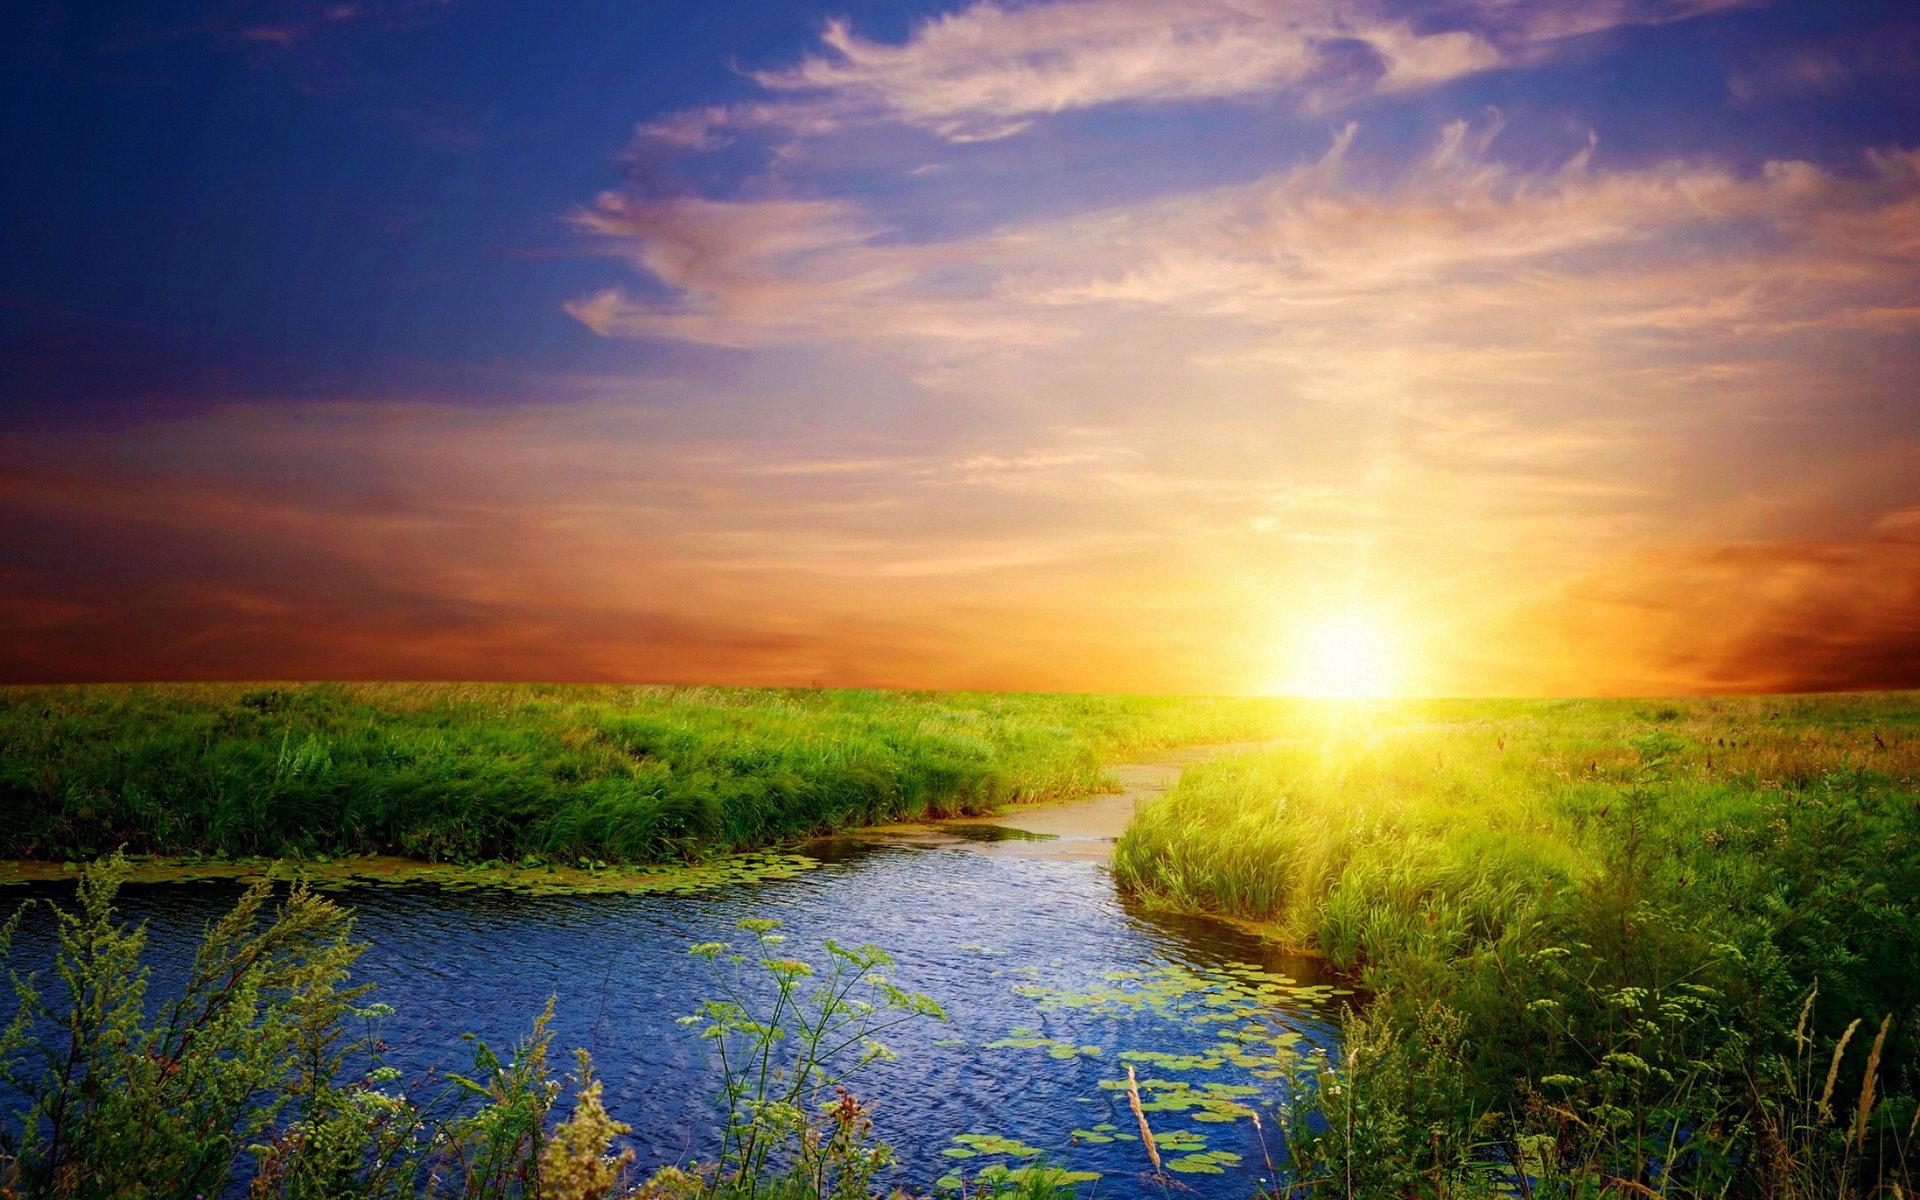 Beautiful Of The Nature - Beautiful Of The Nature